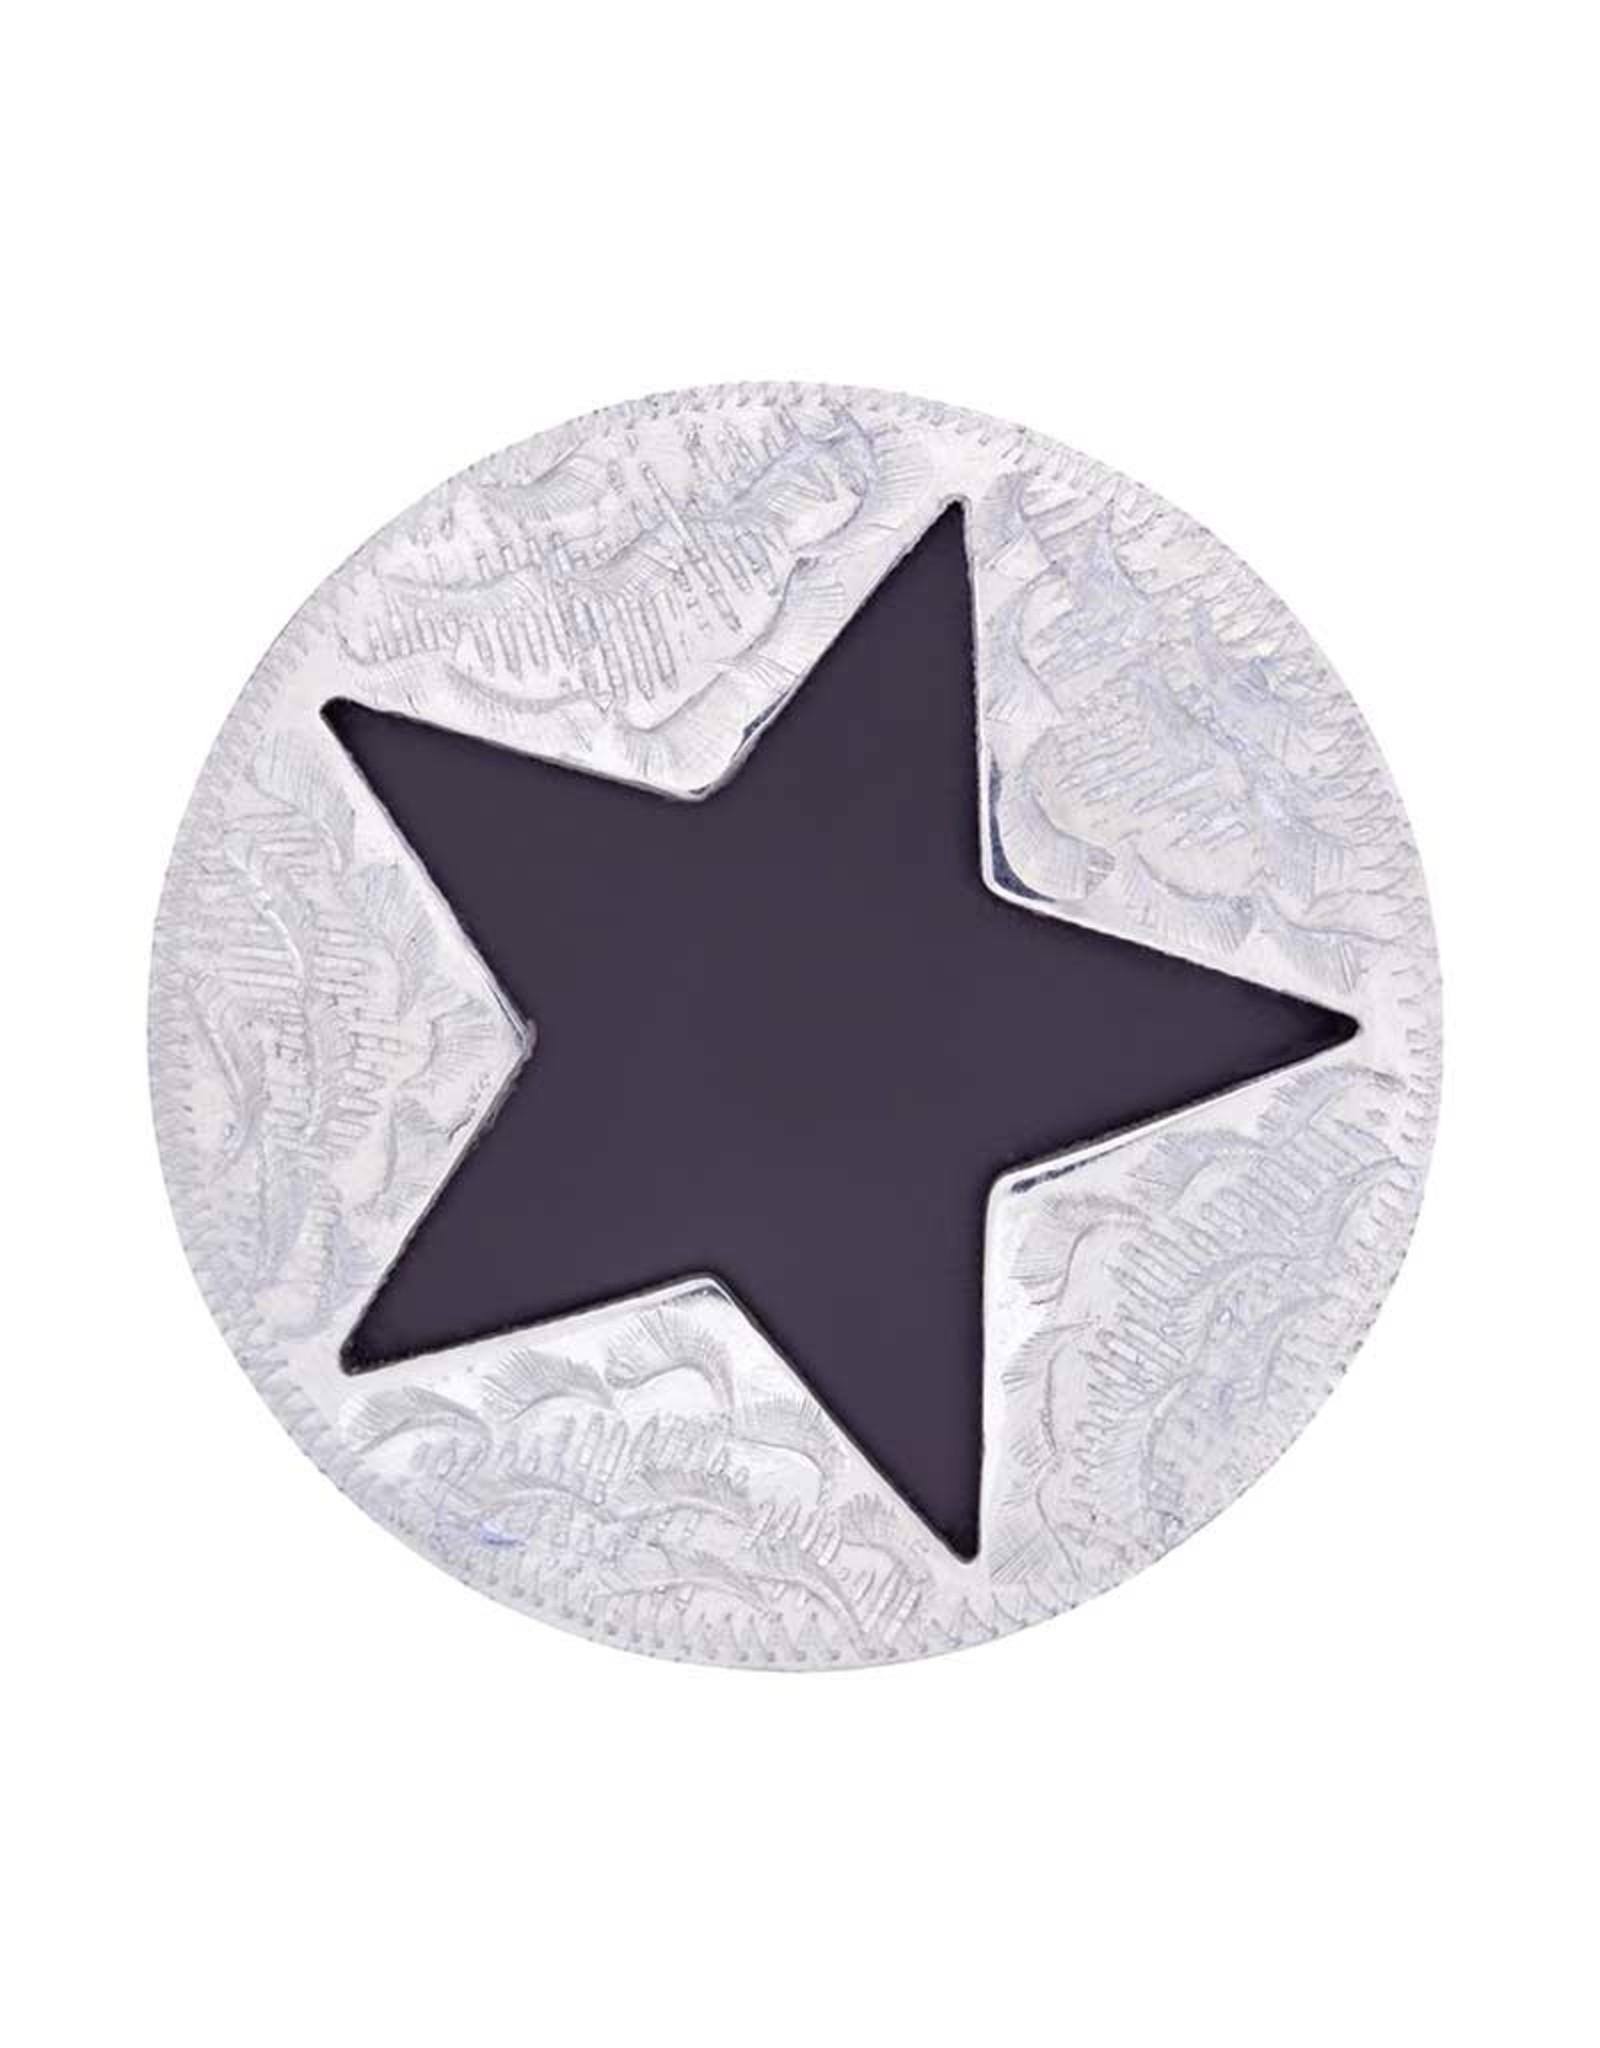 "Metalab Concho Antique Star Cut Out 1"" Pair"